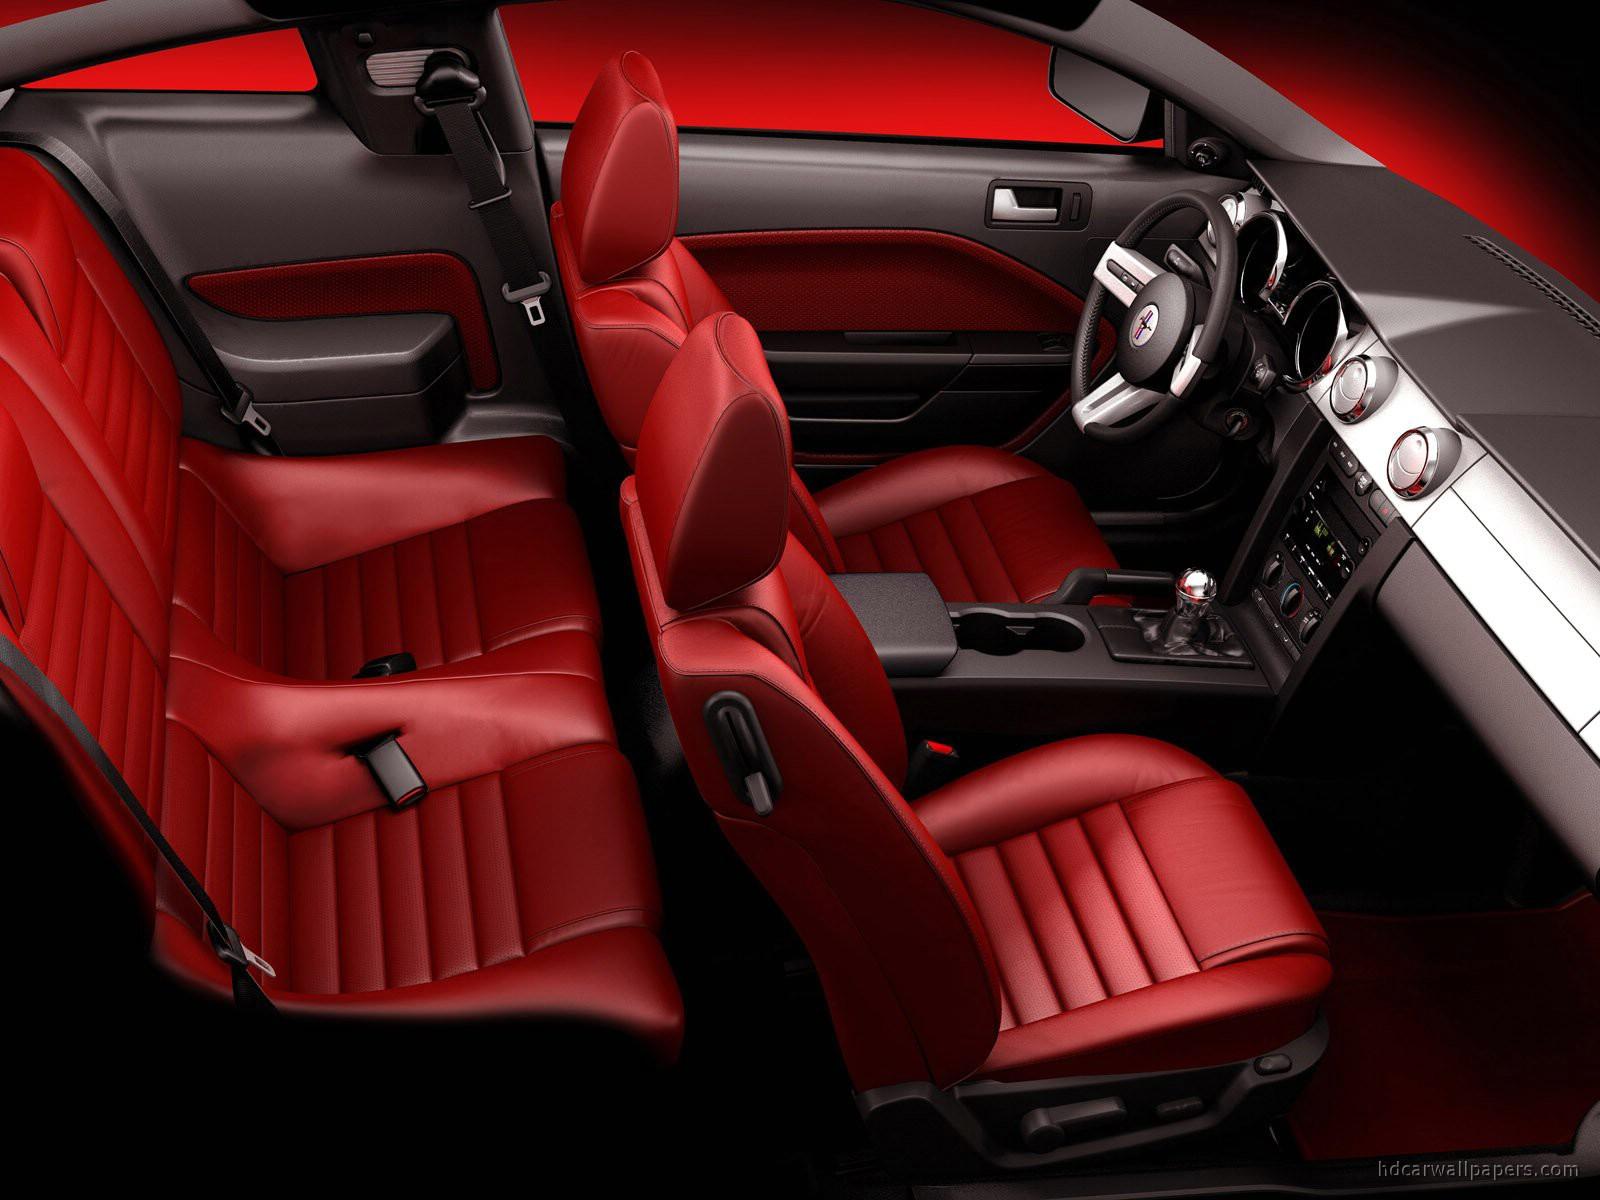 Ford mustang 2005 interior